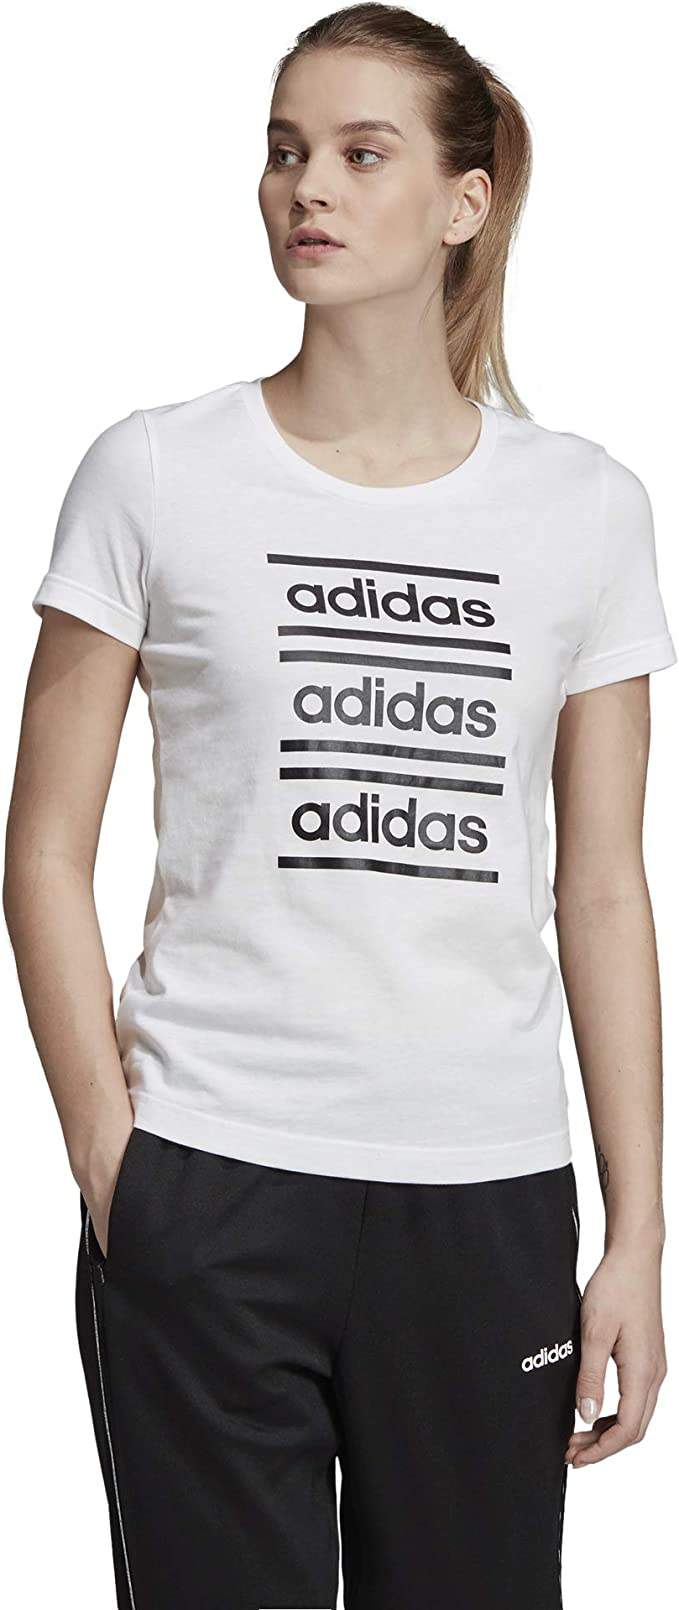 adidas Celebrate The 90s, T Shirt pour Femme: